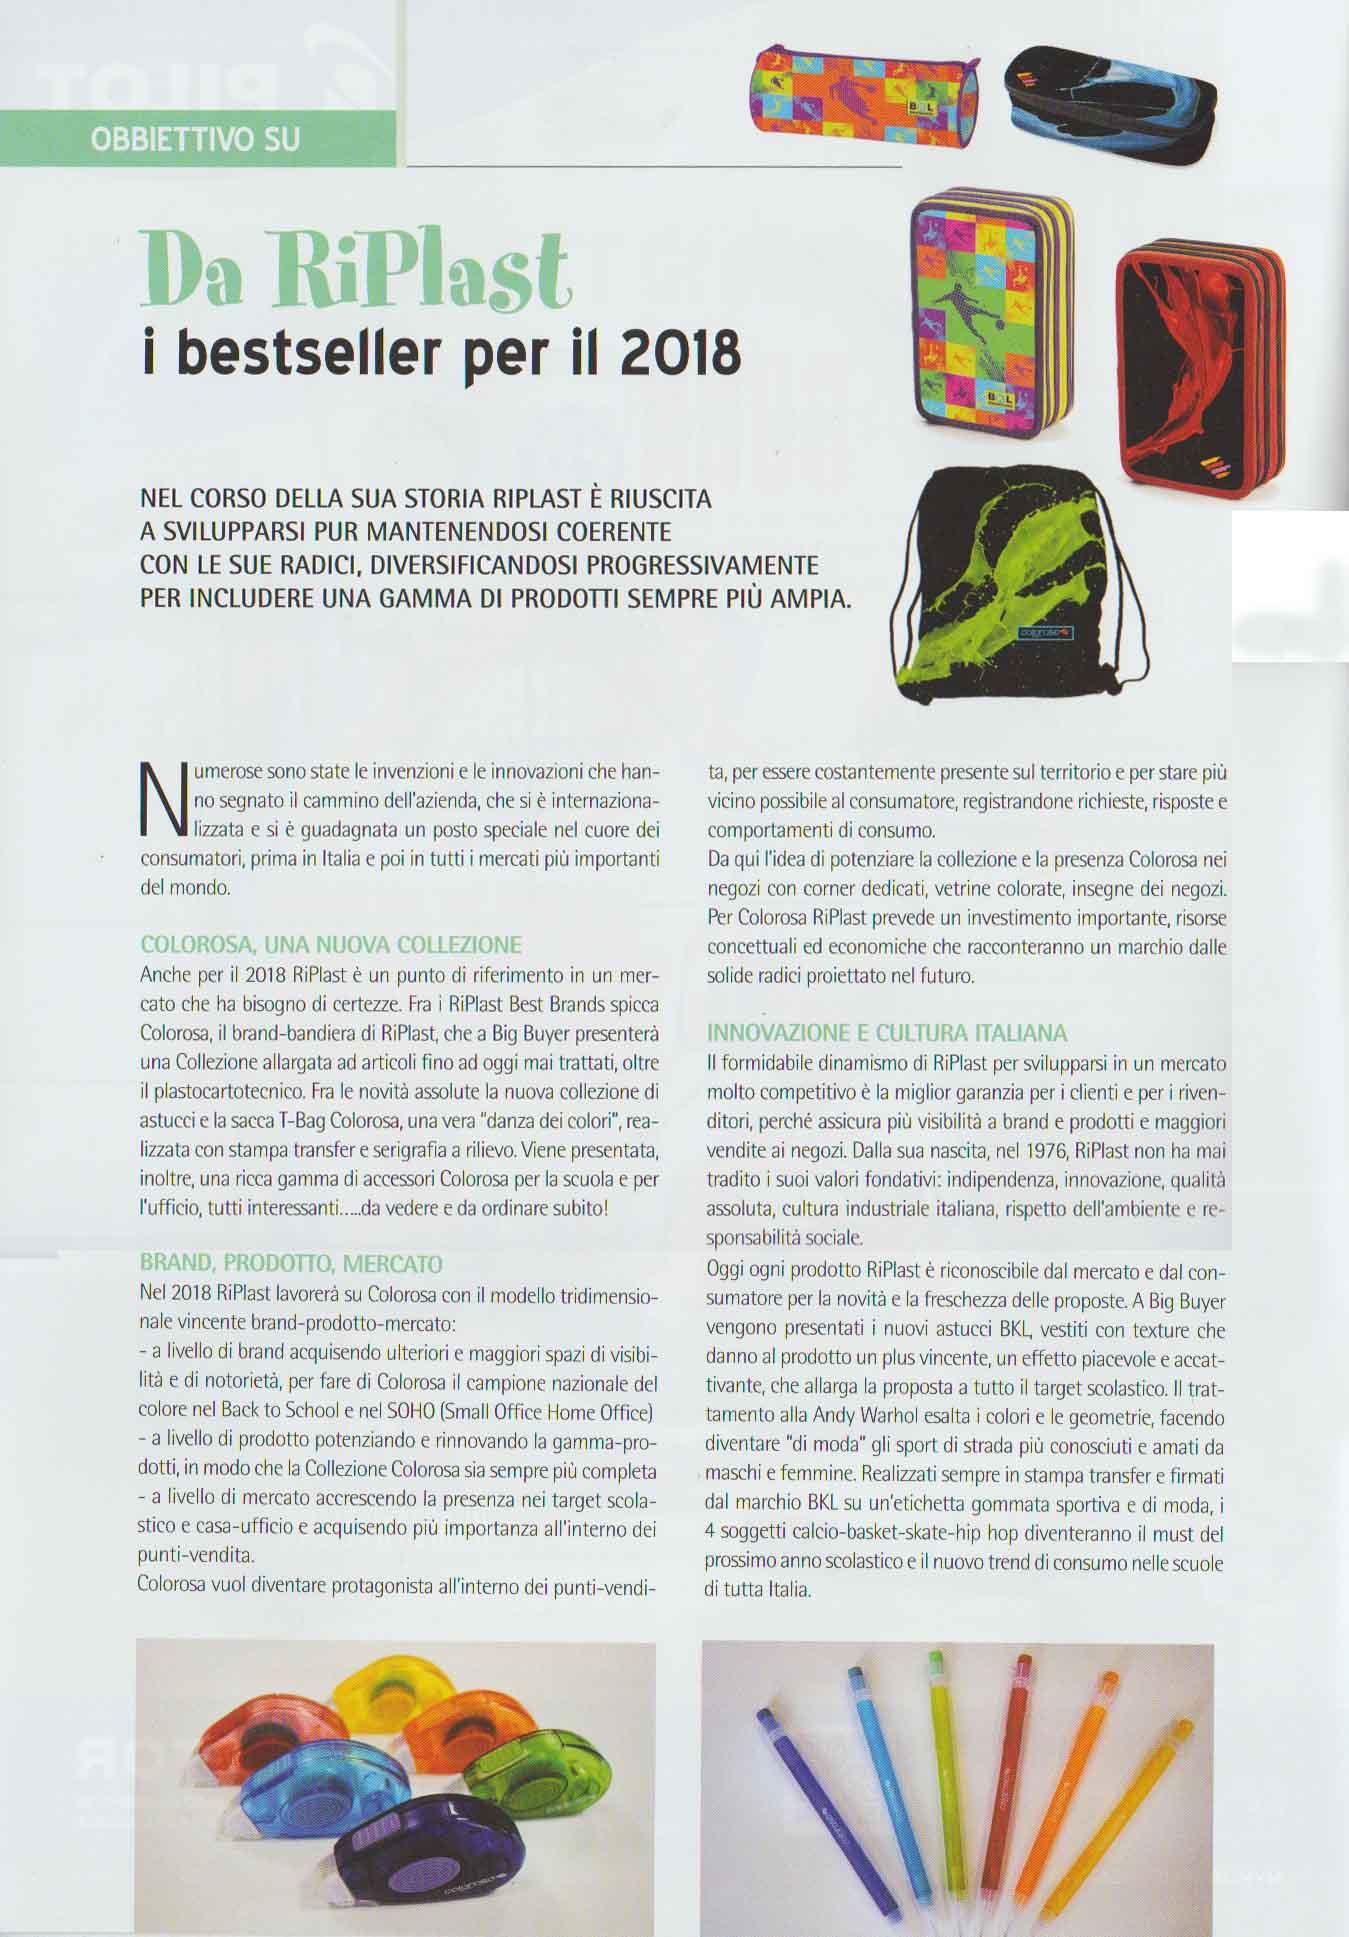 INCART nov 2017 - Collezione Colorosa Big Buyer 2017